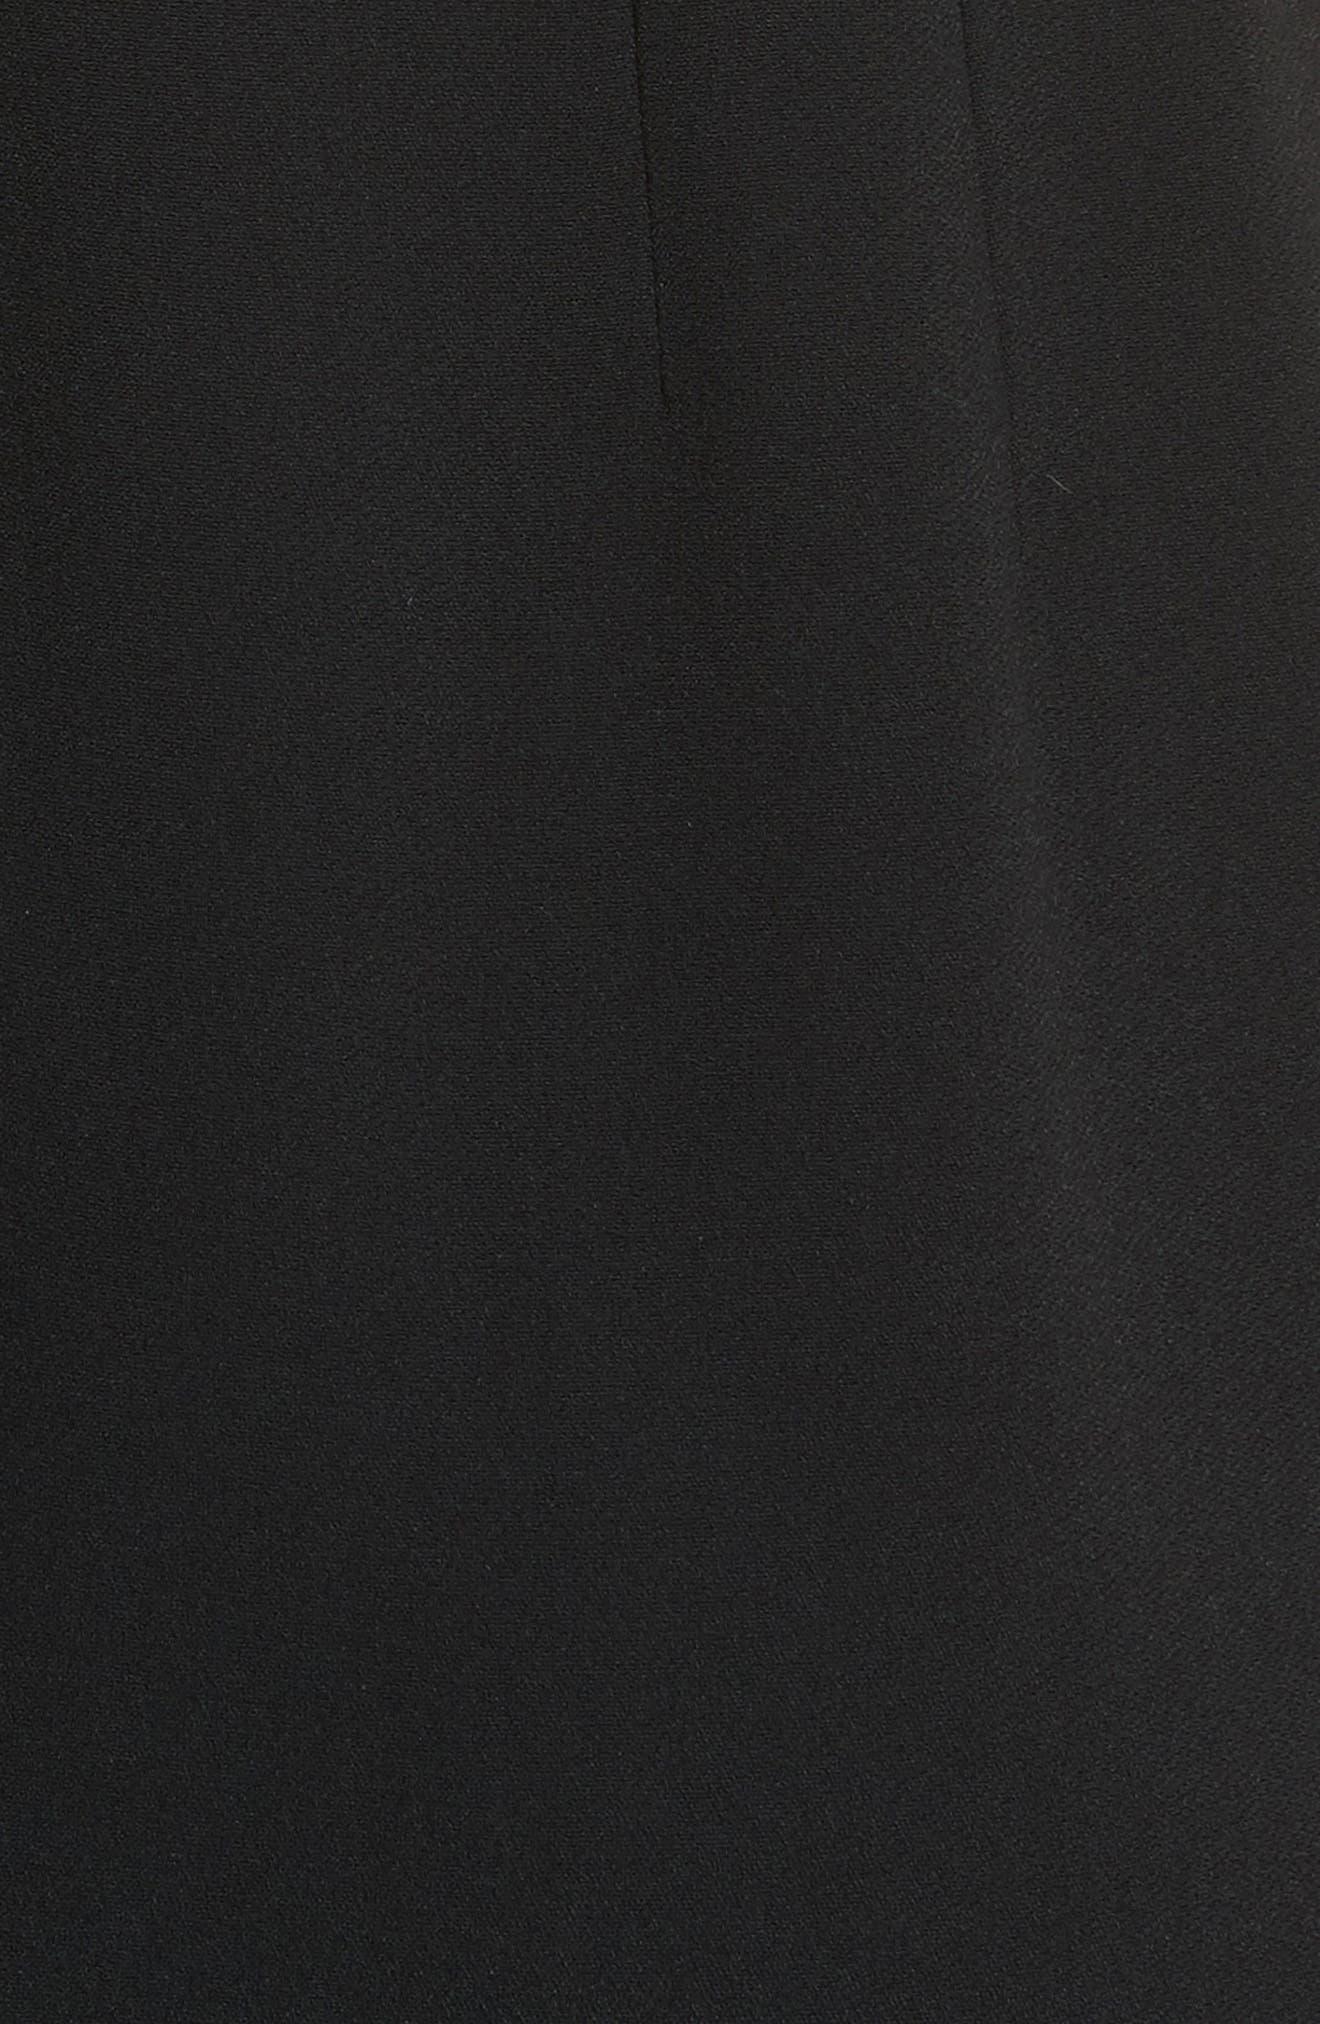 Stretch Cady Sheath Dress,                             Alternate thumbnail 11, color,